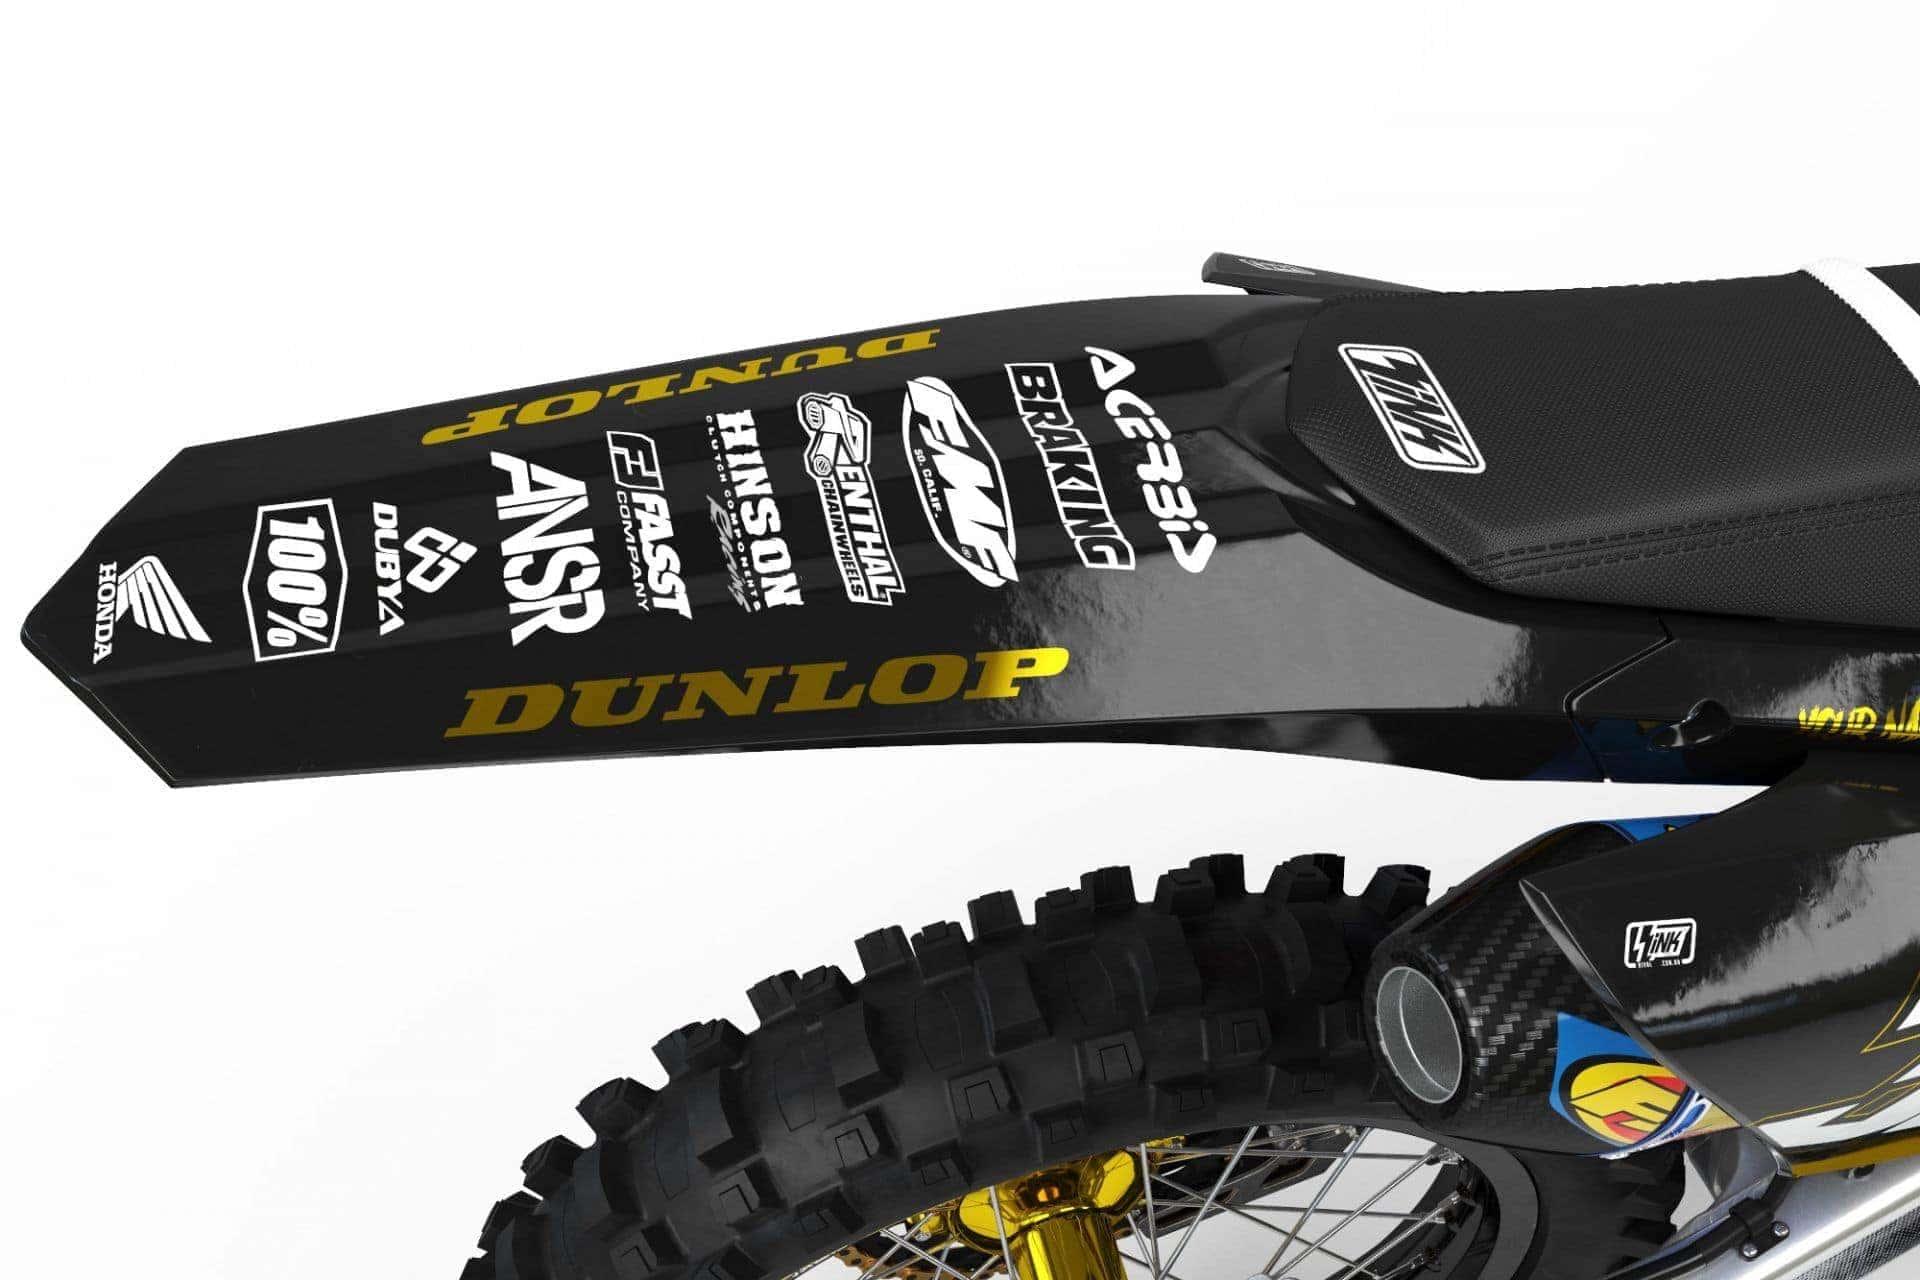 Neon yellow kit rival ink design co custom motocross graphics - Honda The Rivals Prestige Kit